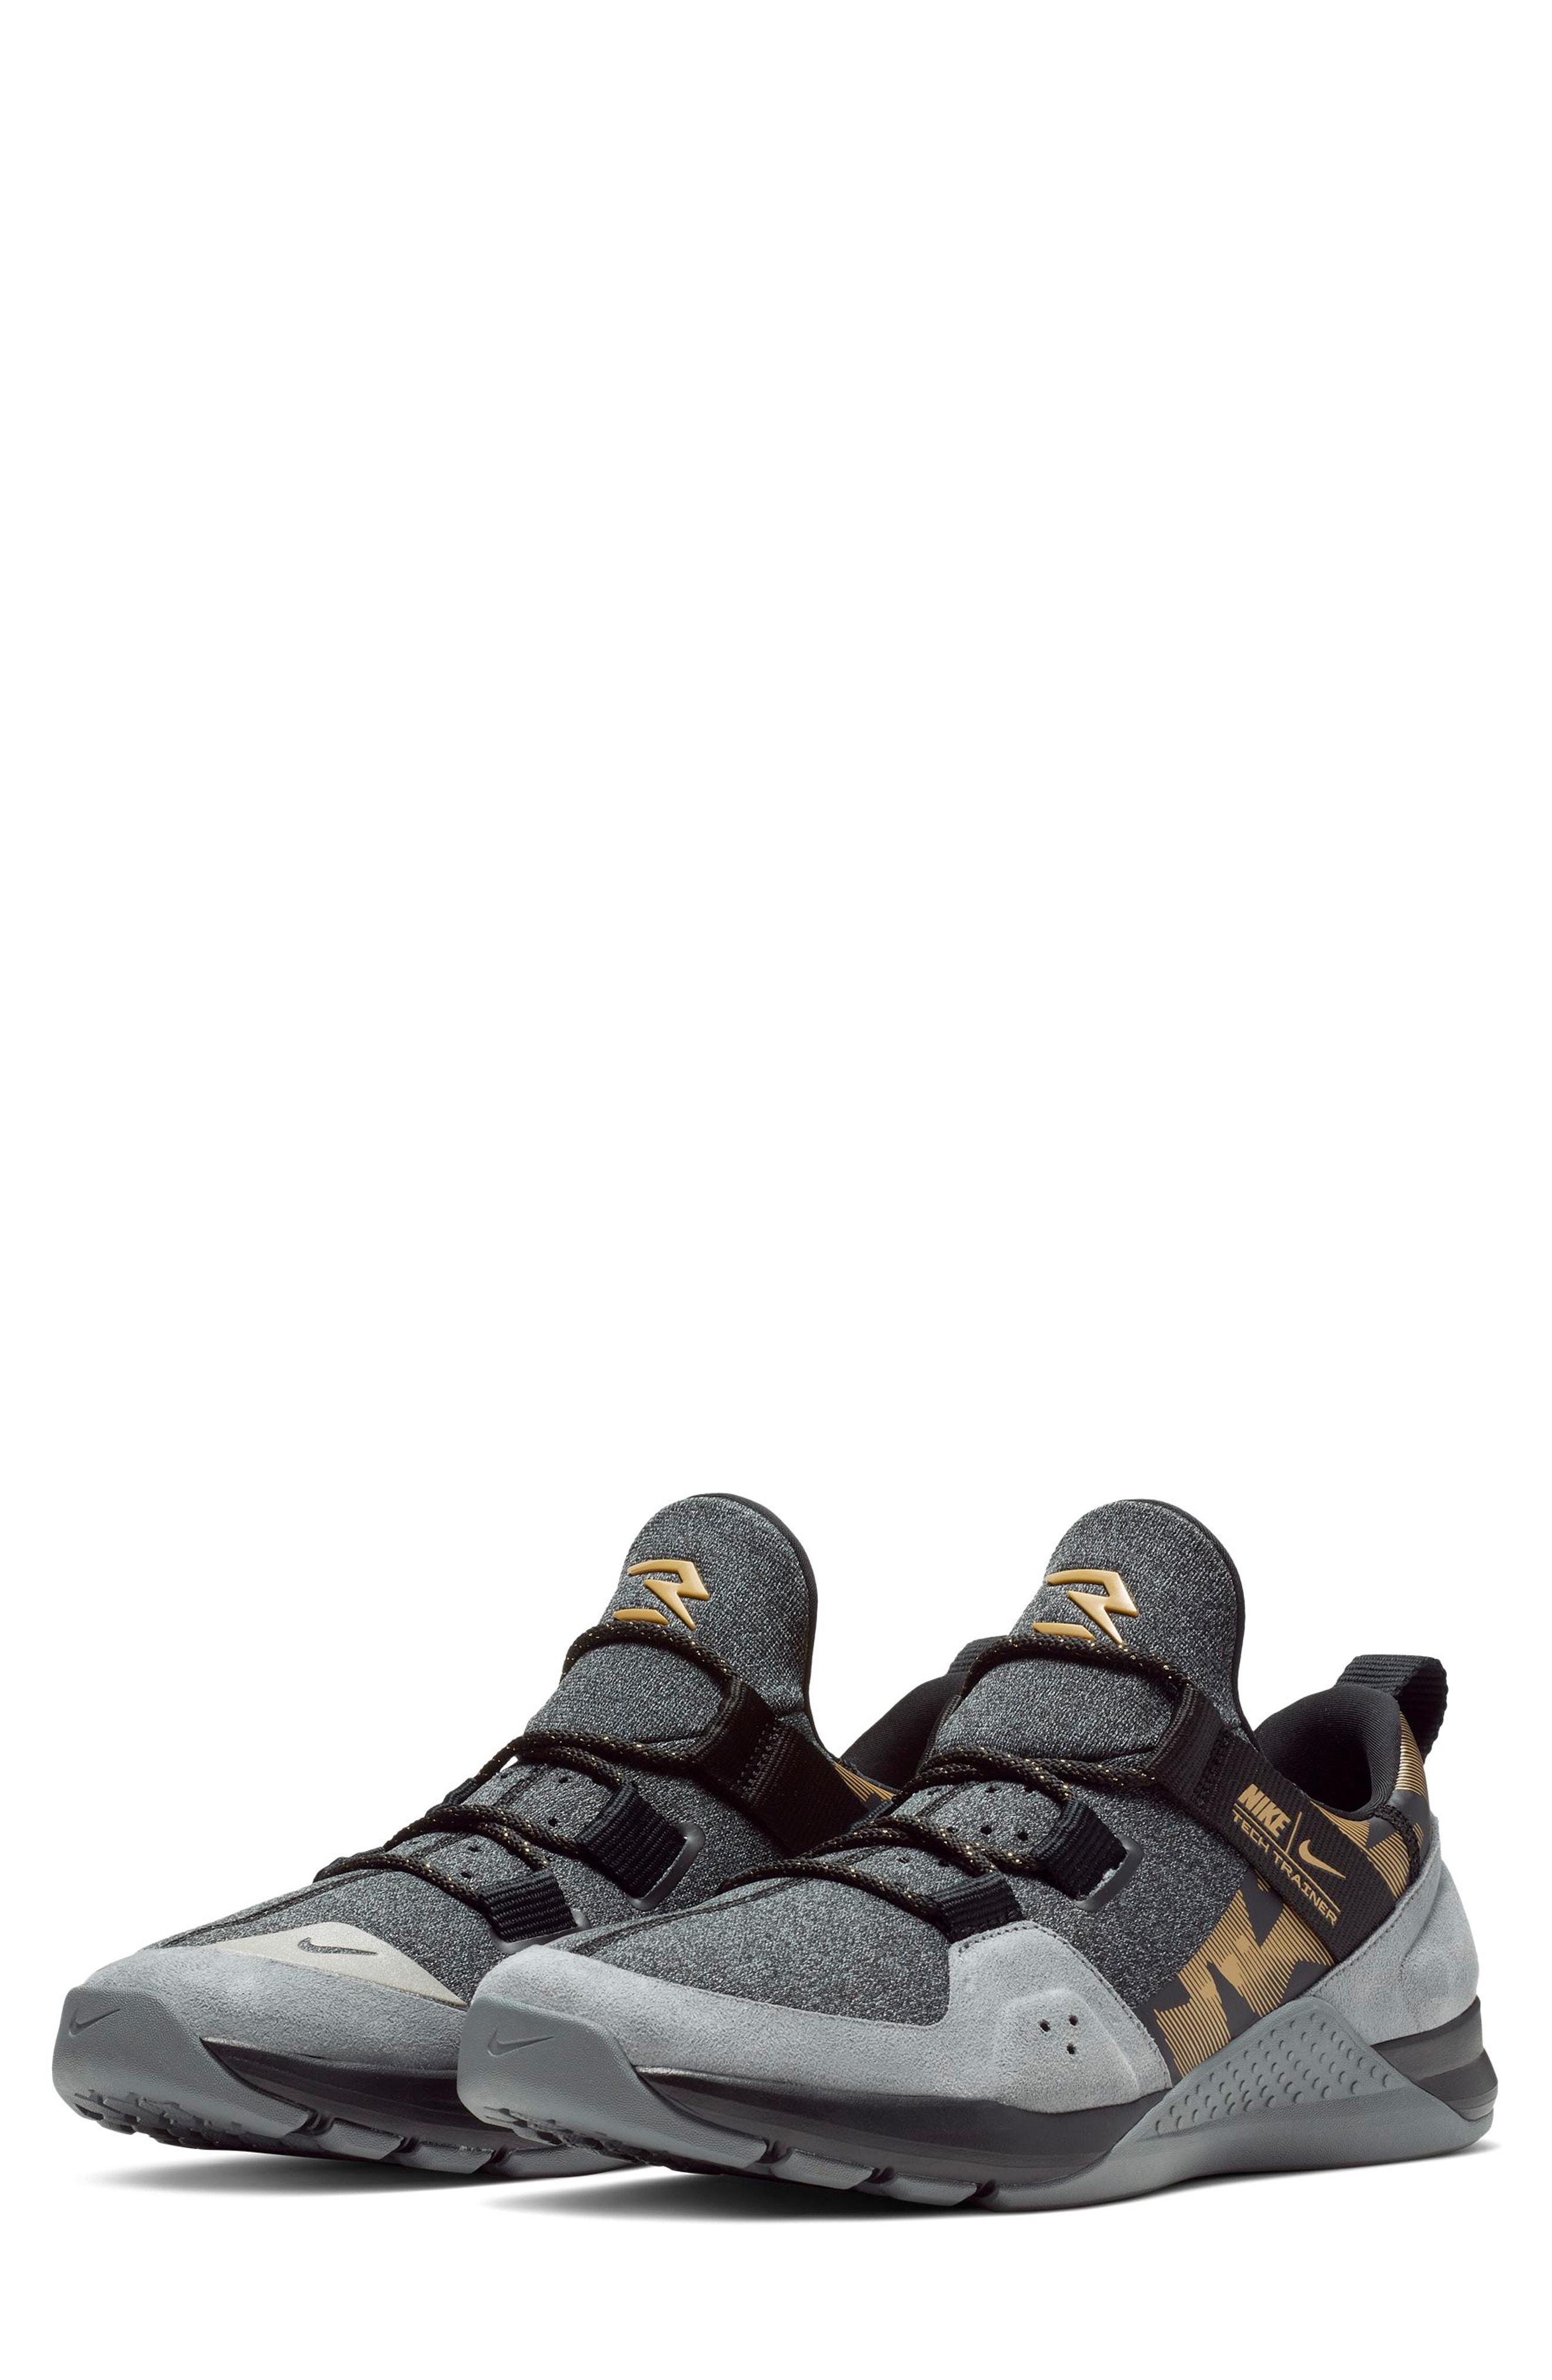 Nike Tech Trainer - Russell Wilson